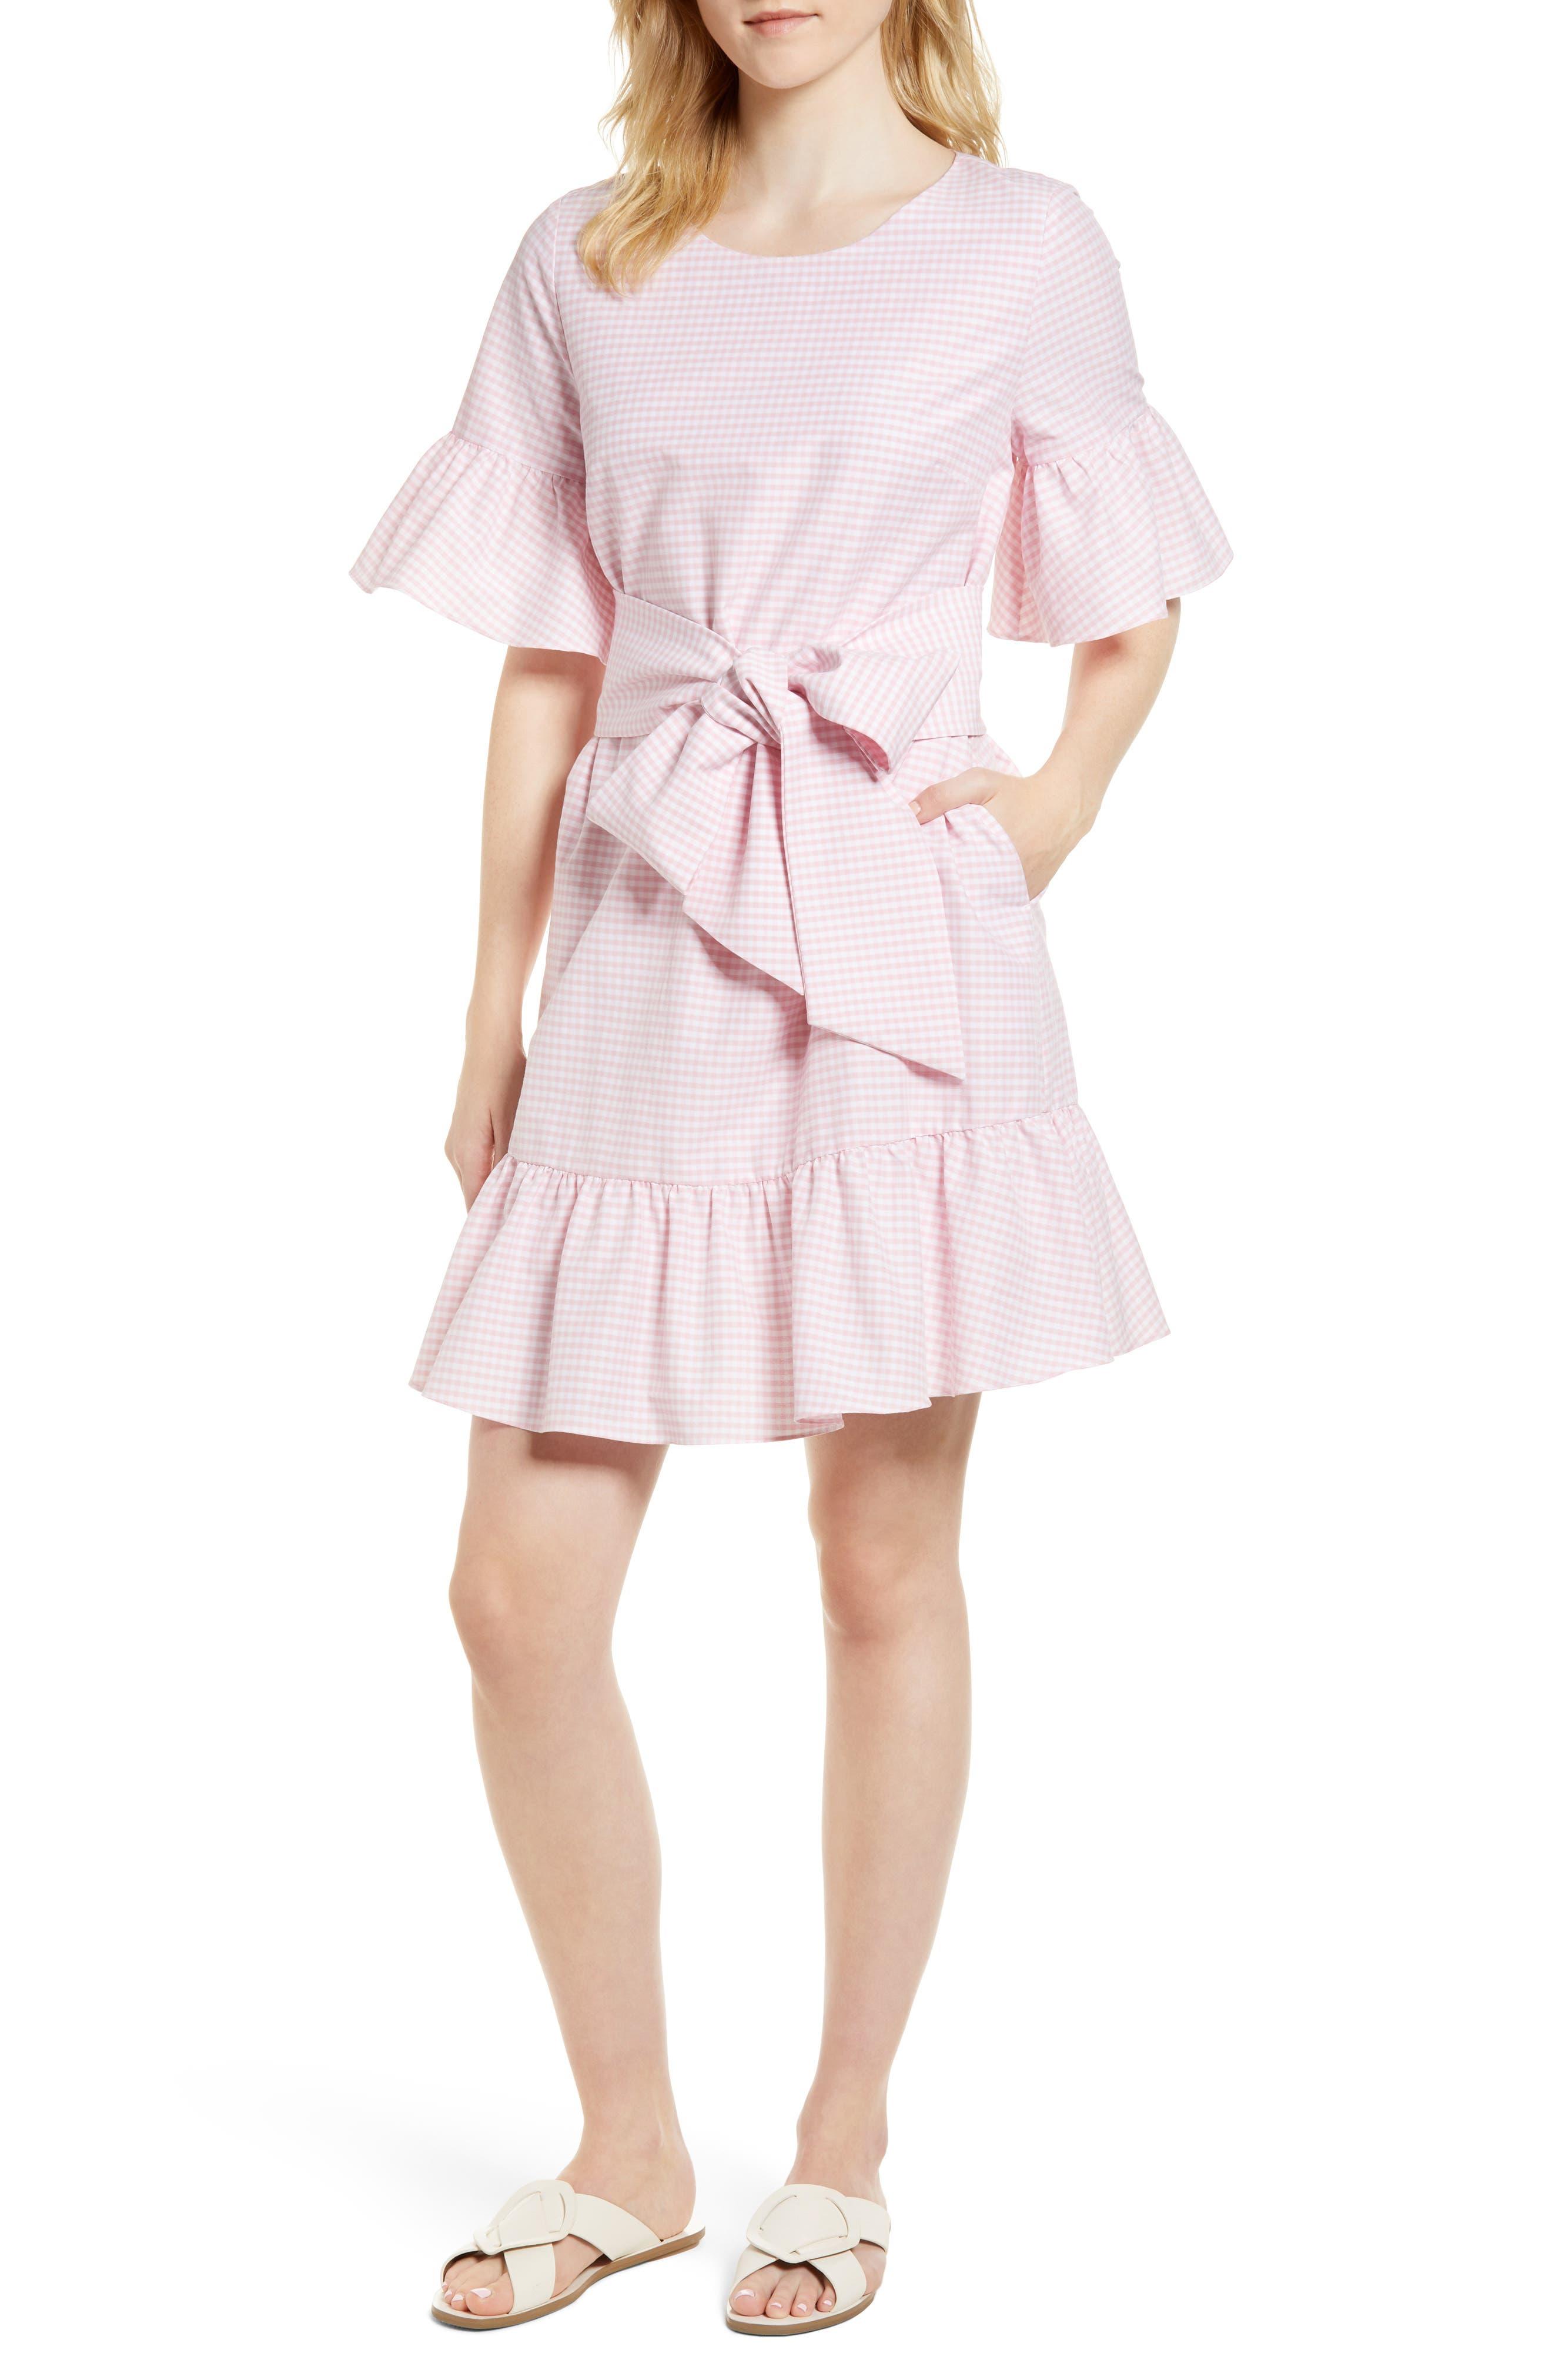 1901 Ruffle & Bow Dress